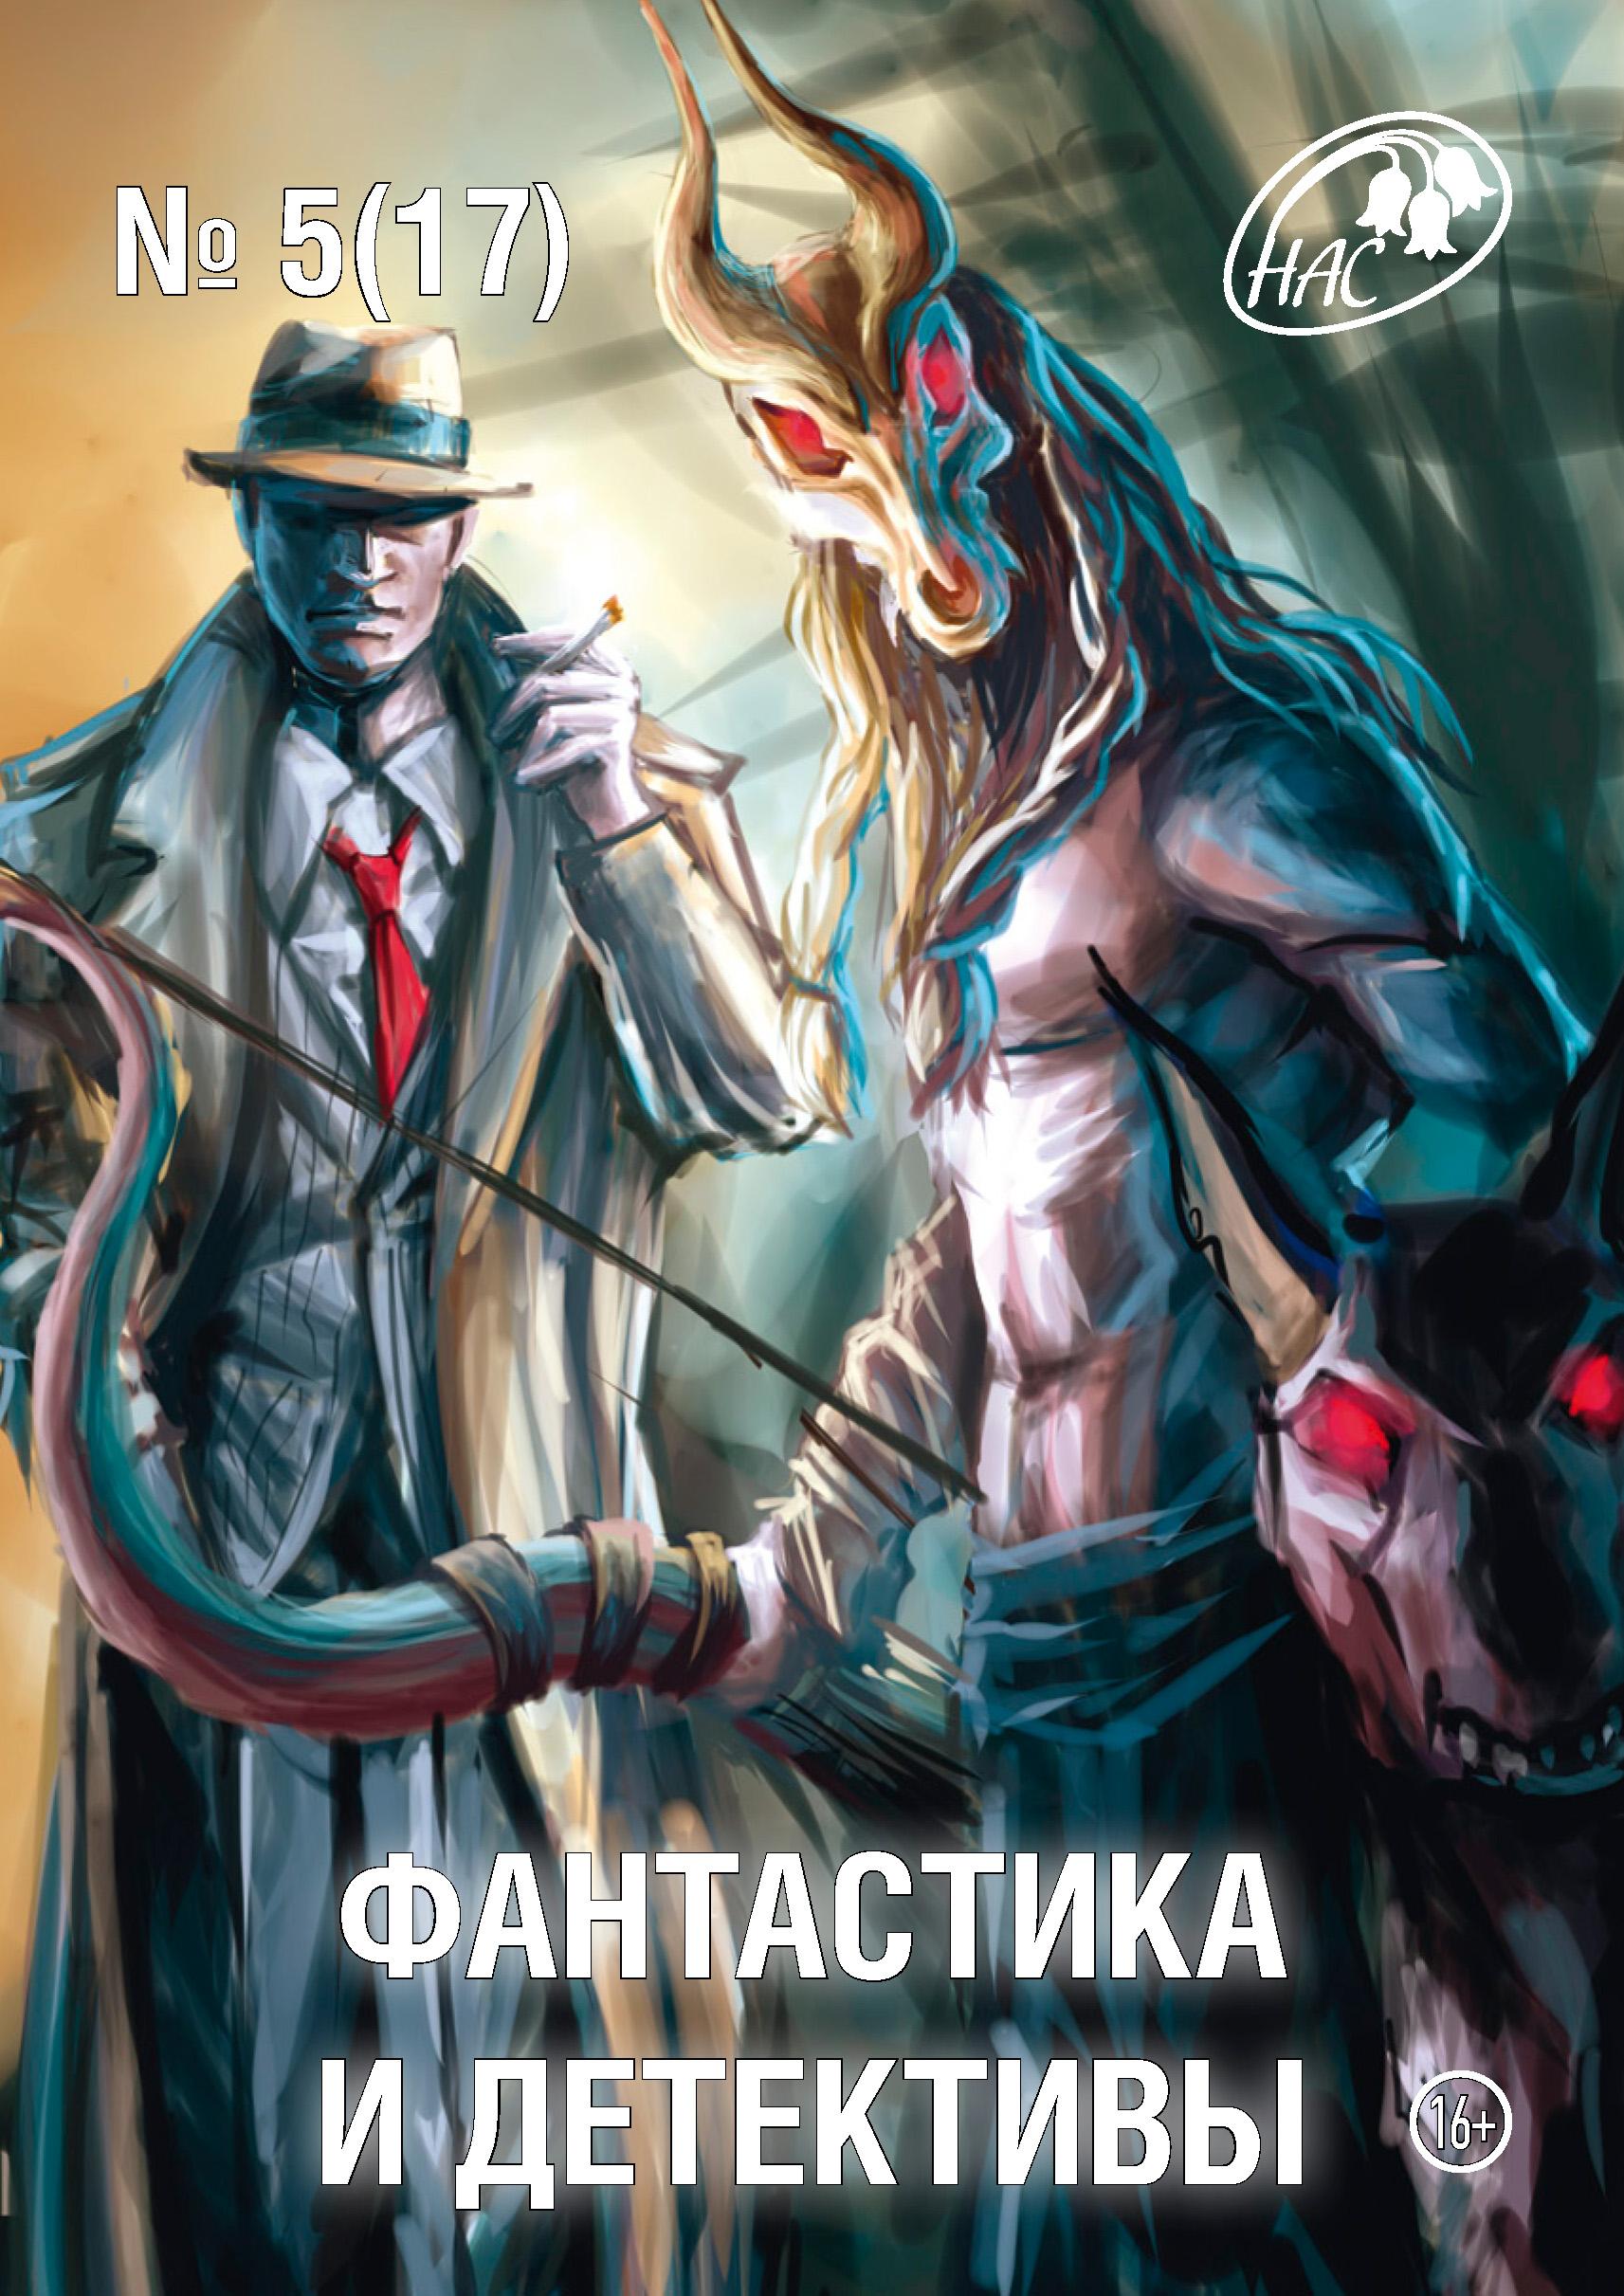 Сборник Журнал «Фантастика и Детективы» №5 (17) 2014 сборник журнал фантастика и детективы 5